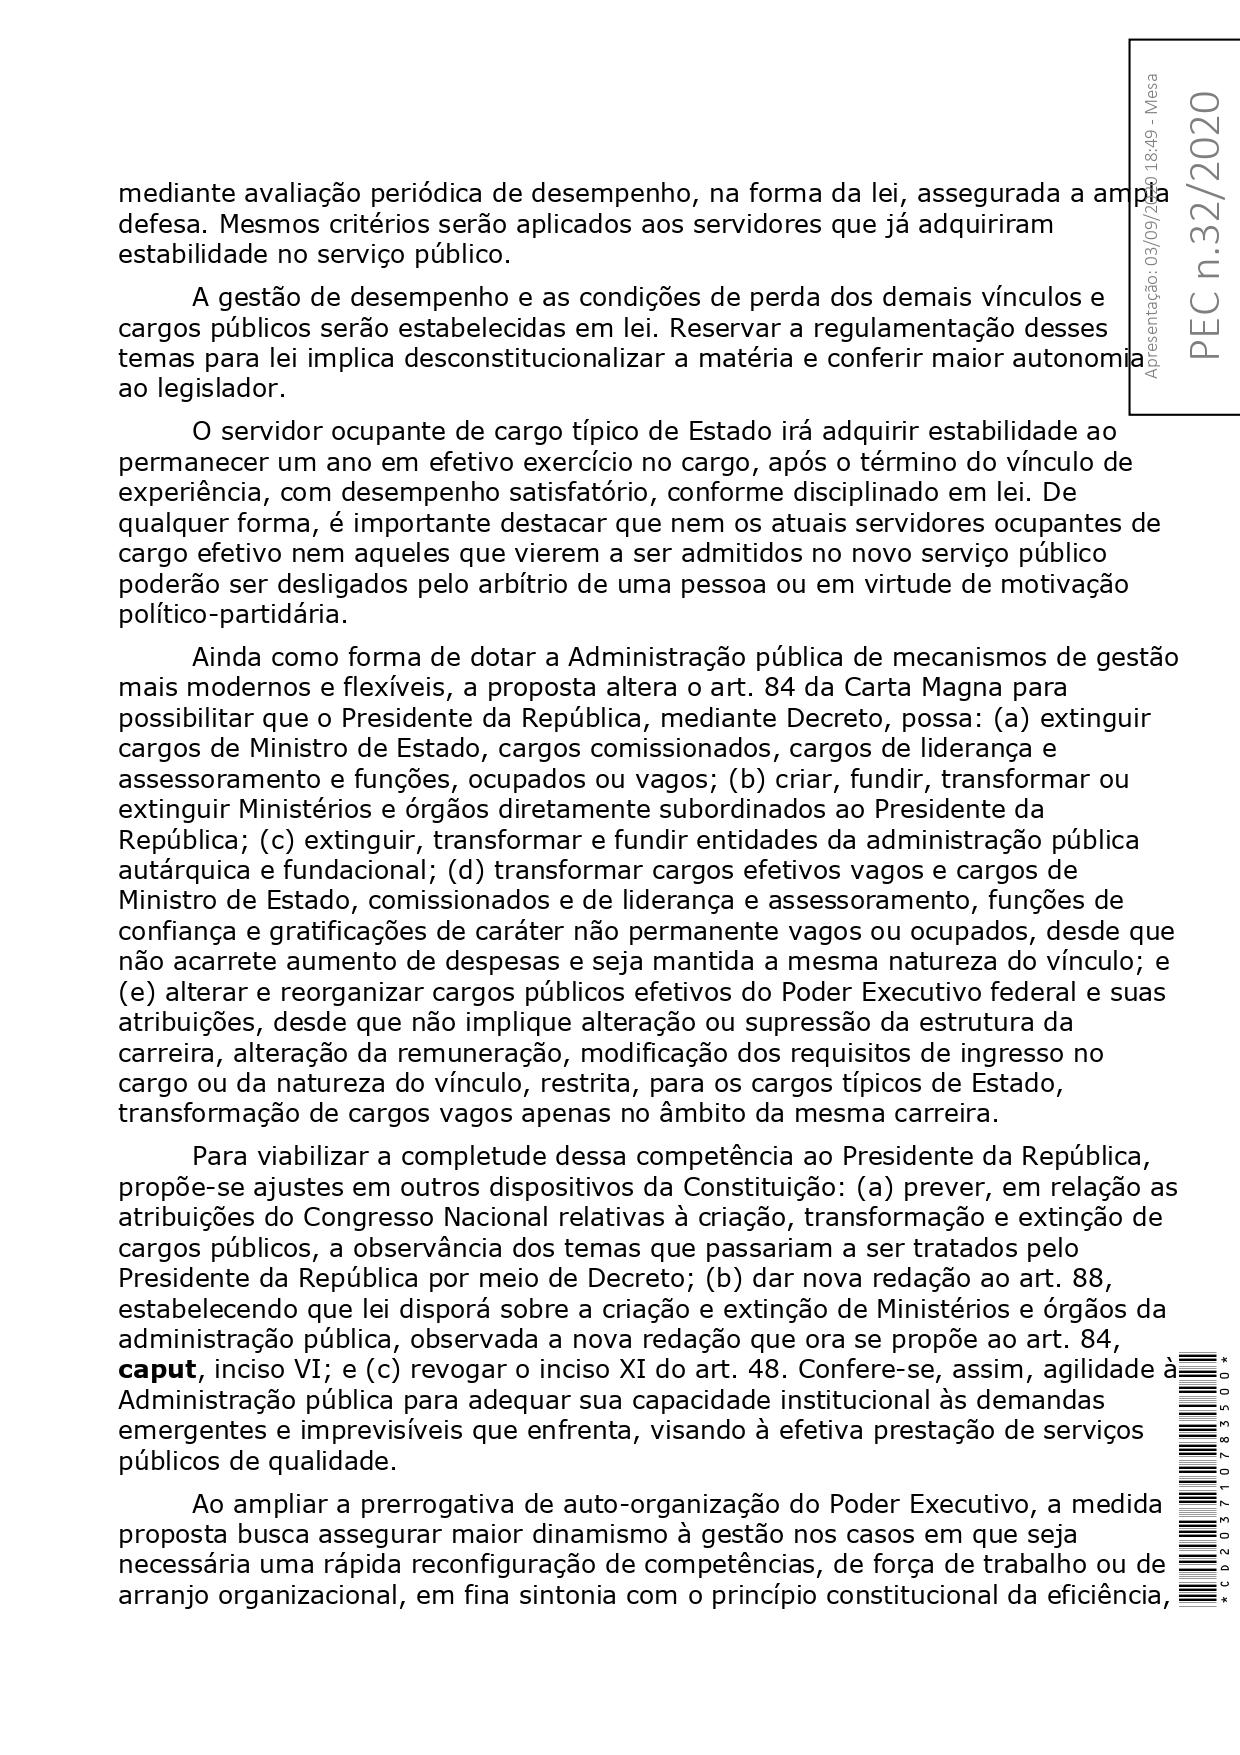 PEC-32-2020_page-0014.jpg